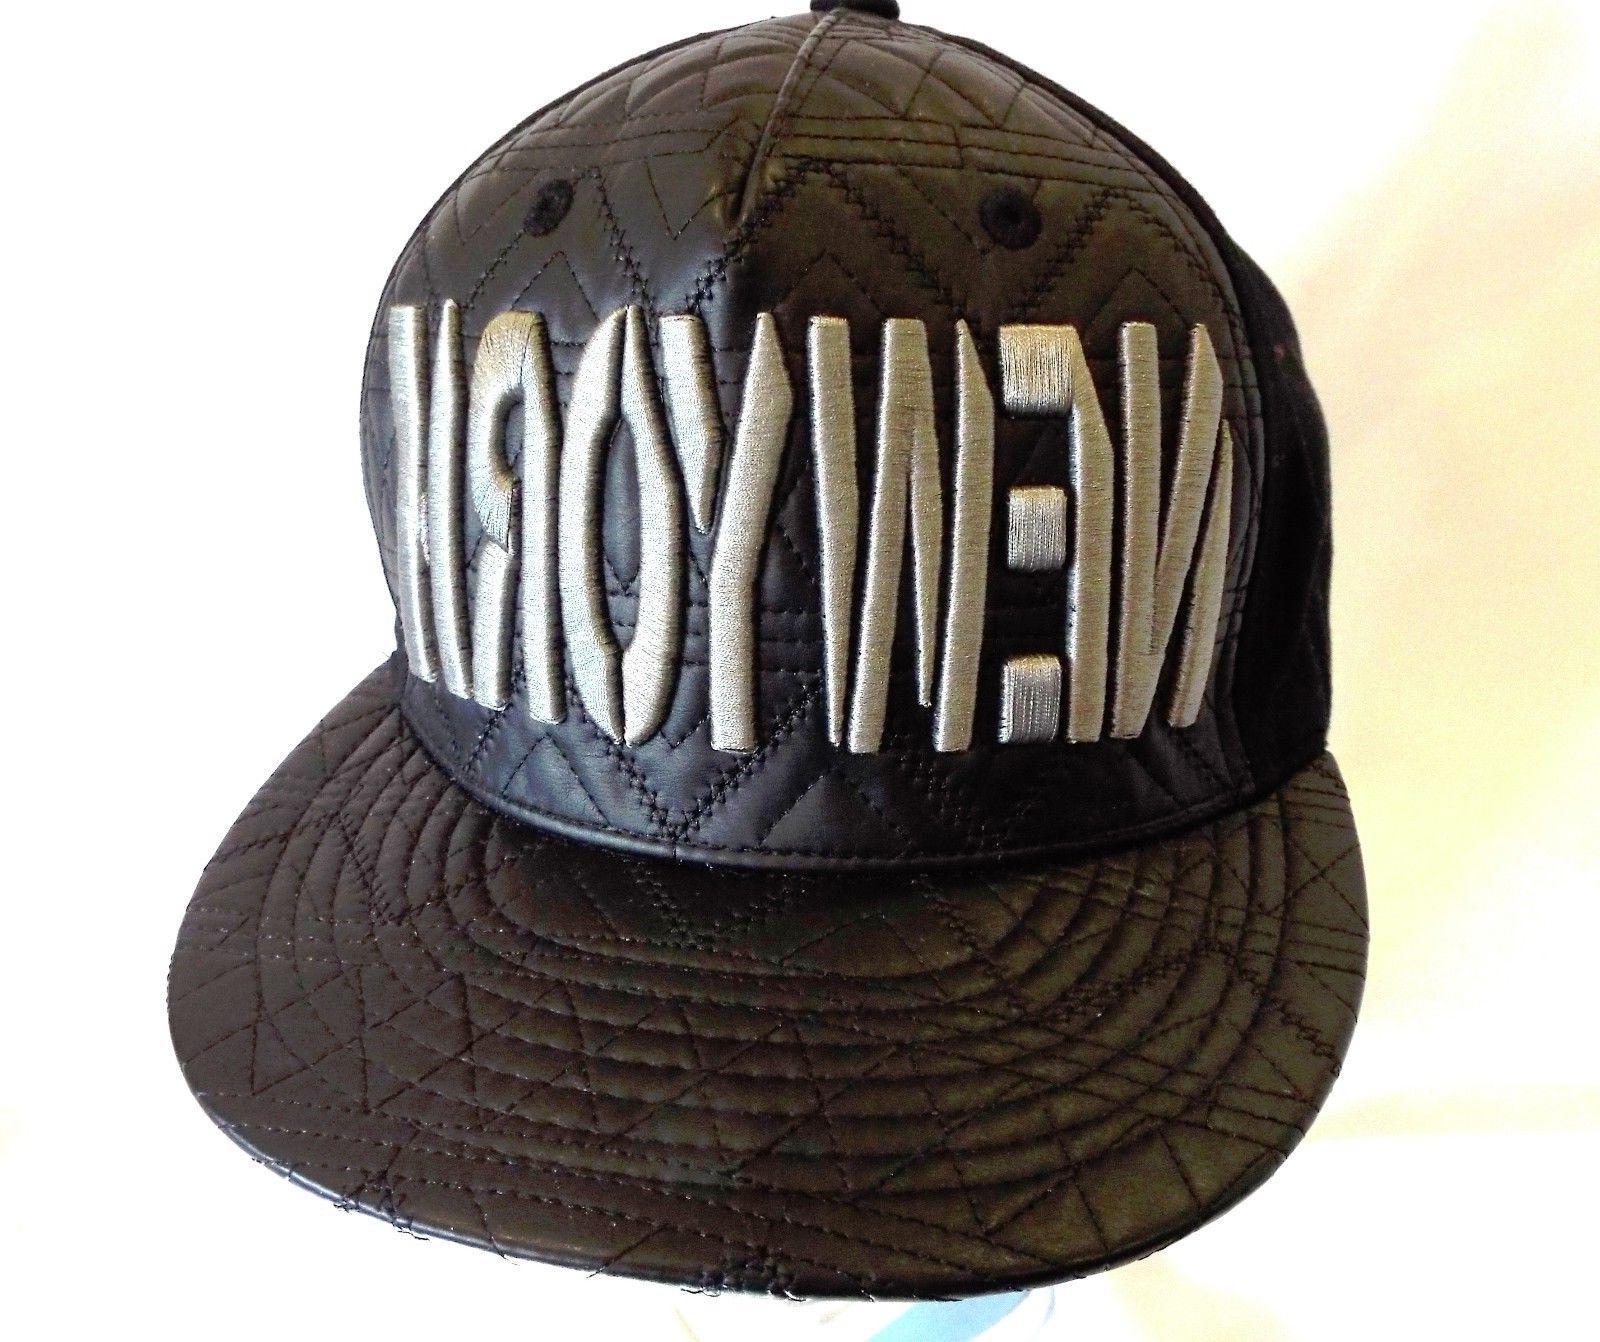 KBETHOS NewYork Snapback Mens Hat Black Pleather with silver